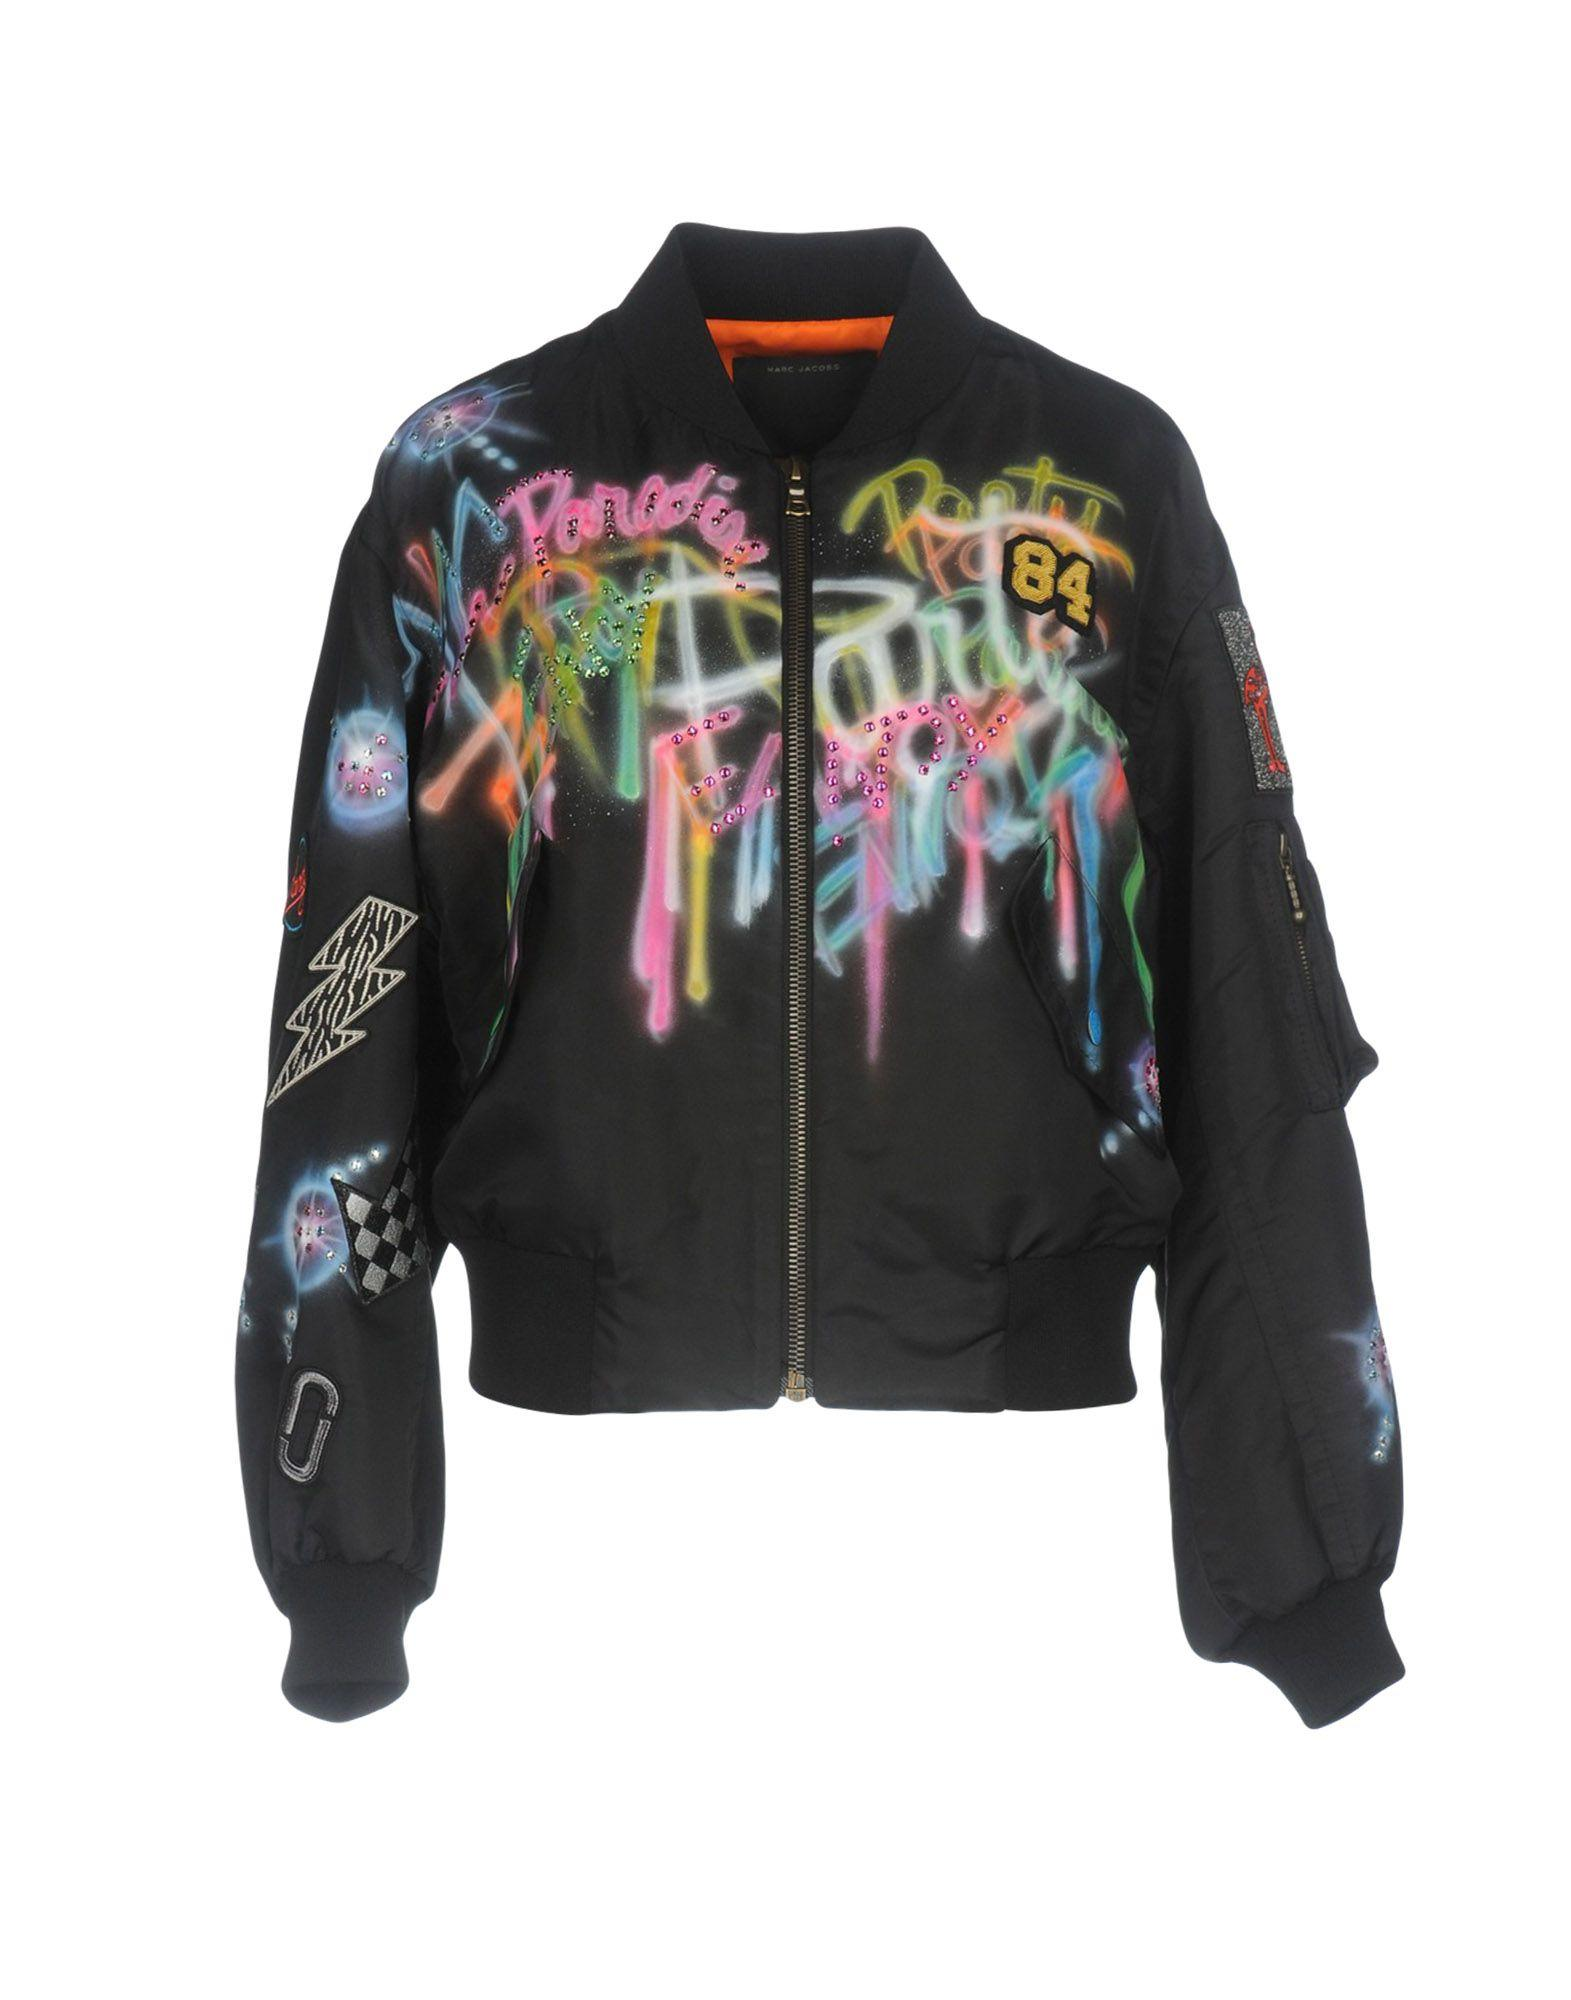 360e5b0a941b Marc Jacobs Embellished Graffiti Print Shrunken Bomber Jacket In Black